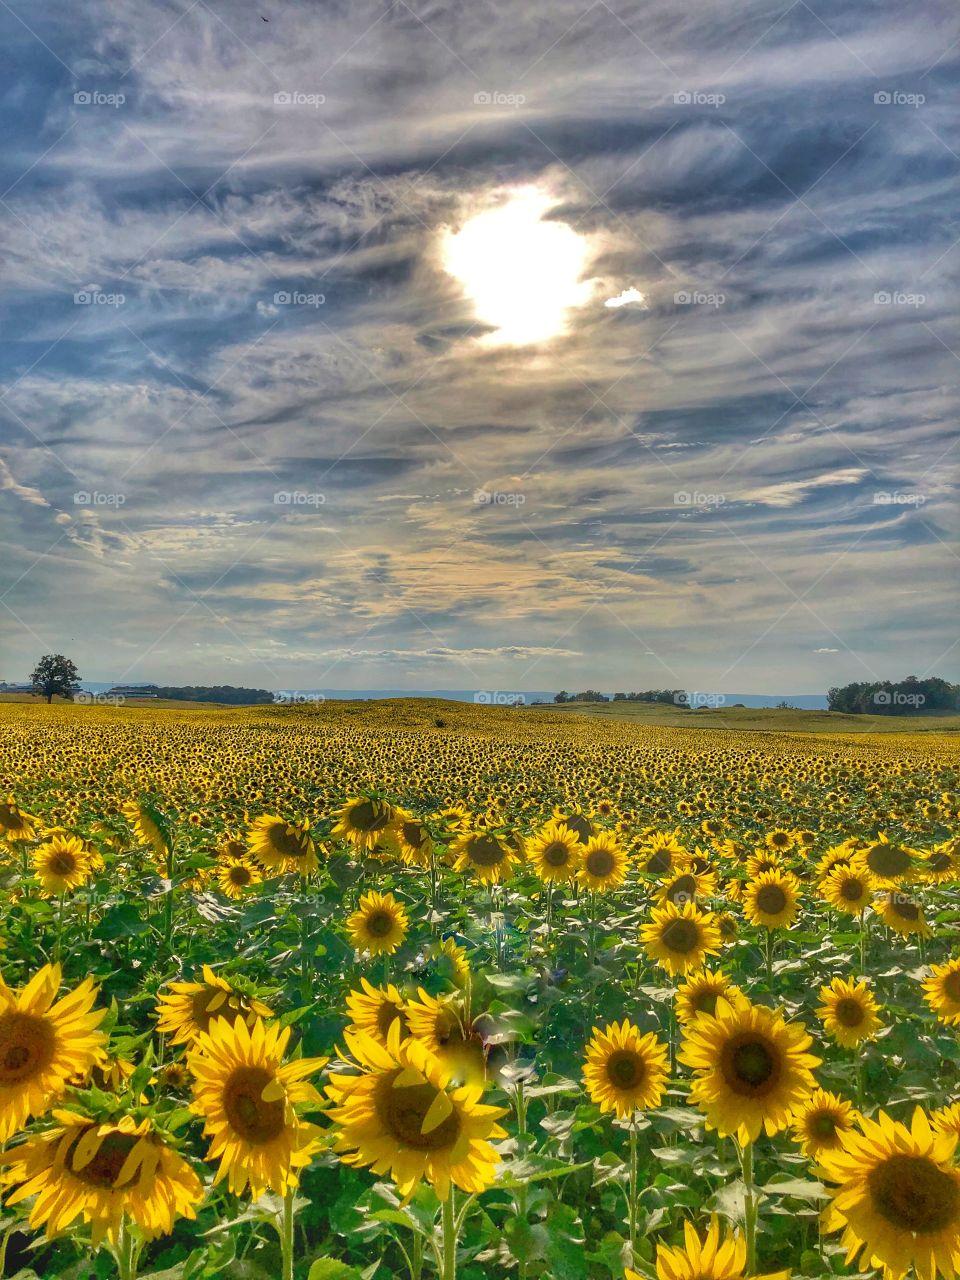 Sunflower farm sun shining September afternoon